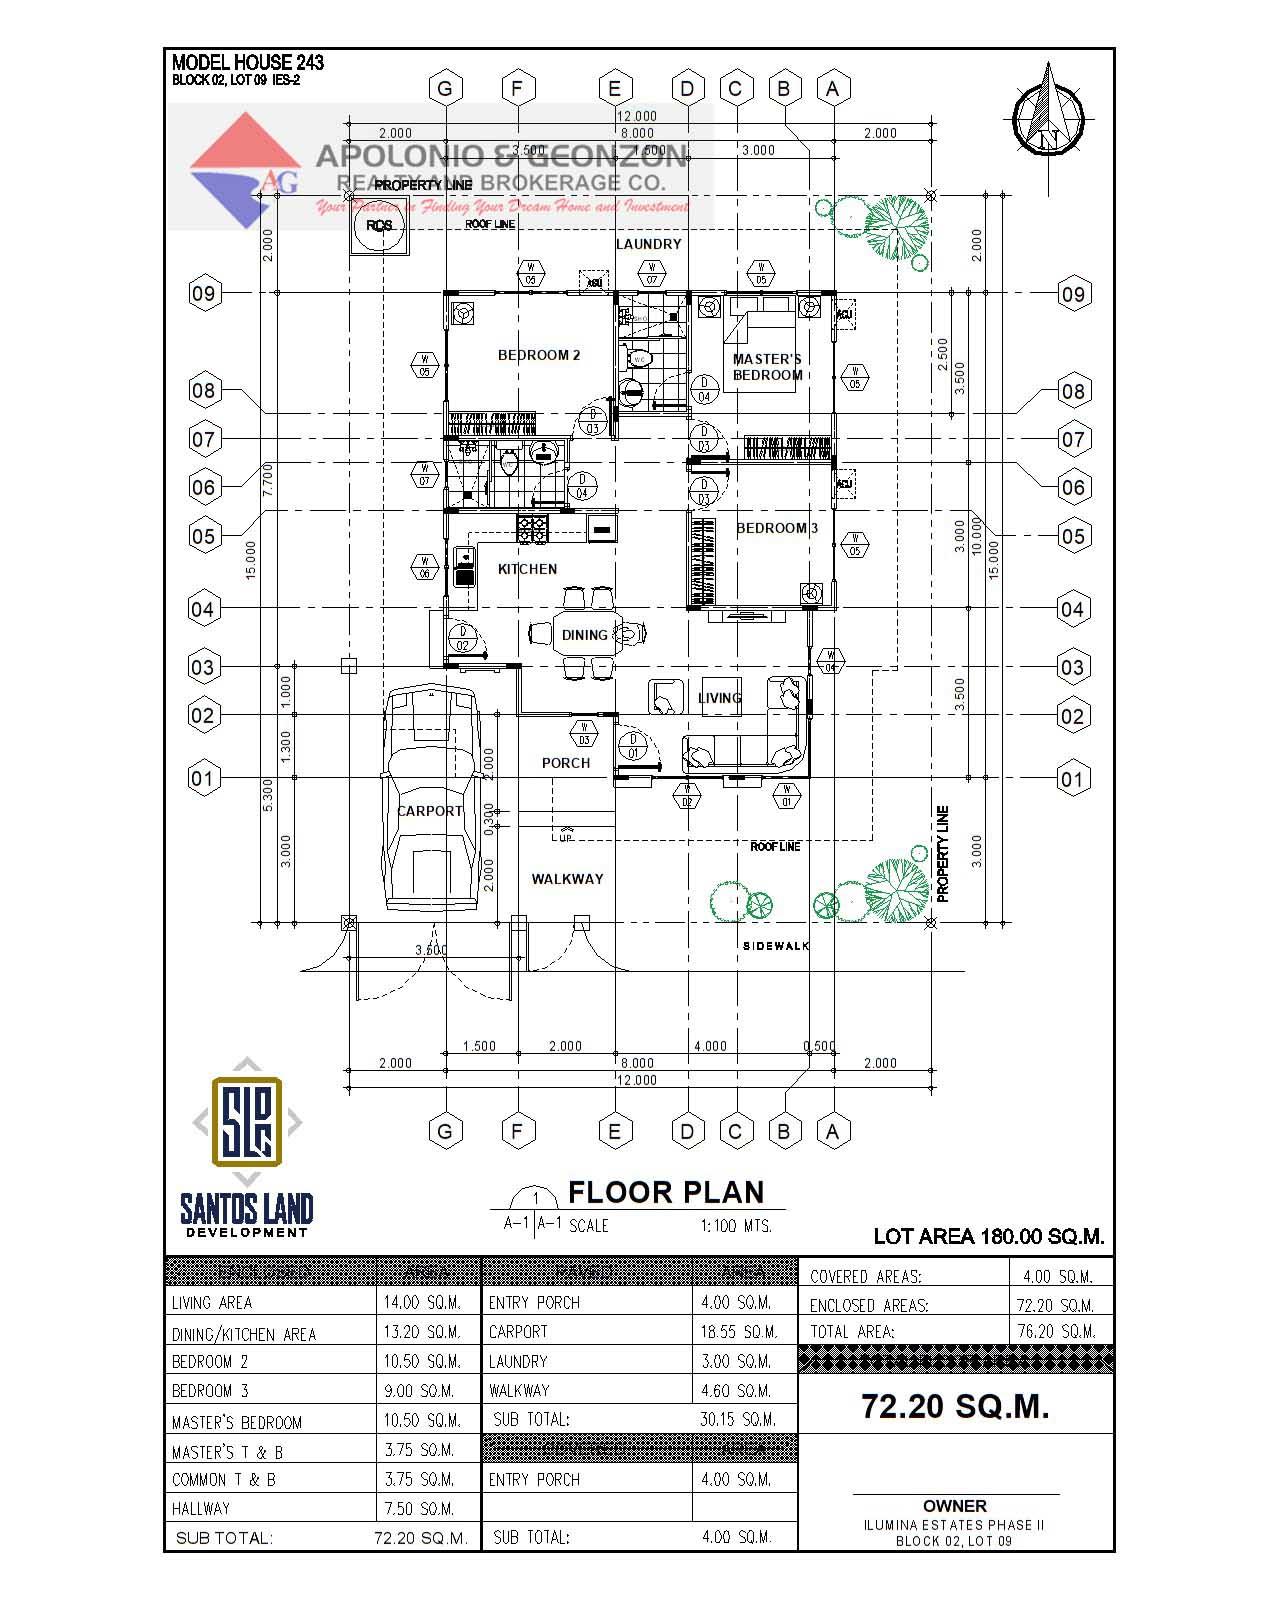 ilumina-estates-davao-model-house-243-floor-plan